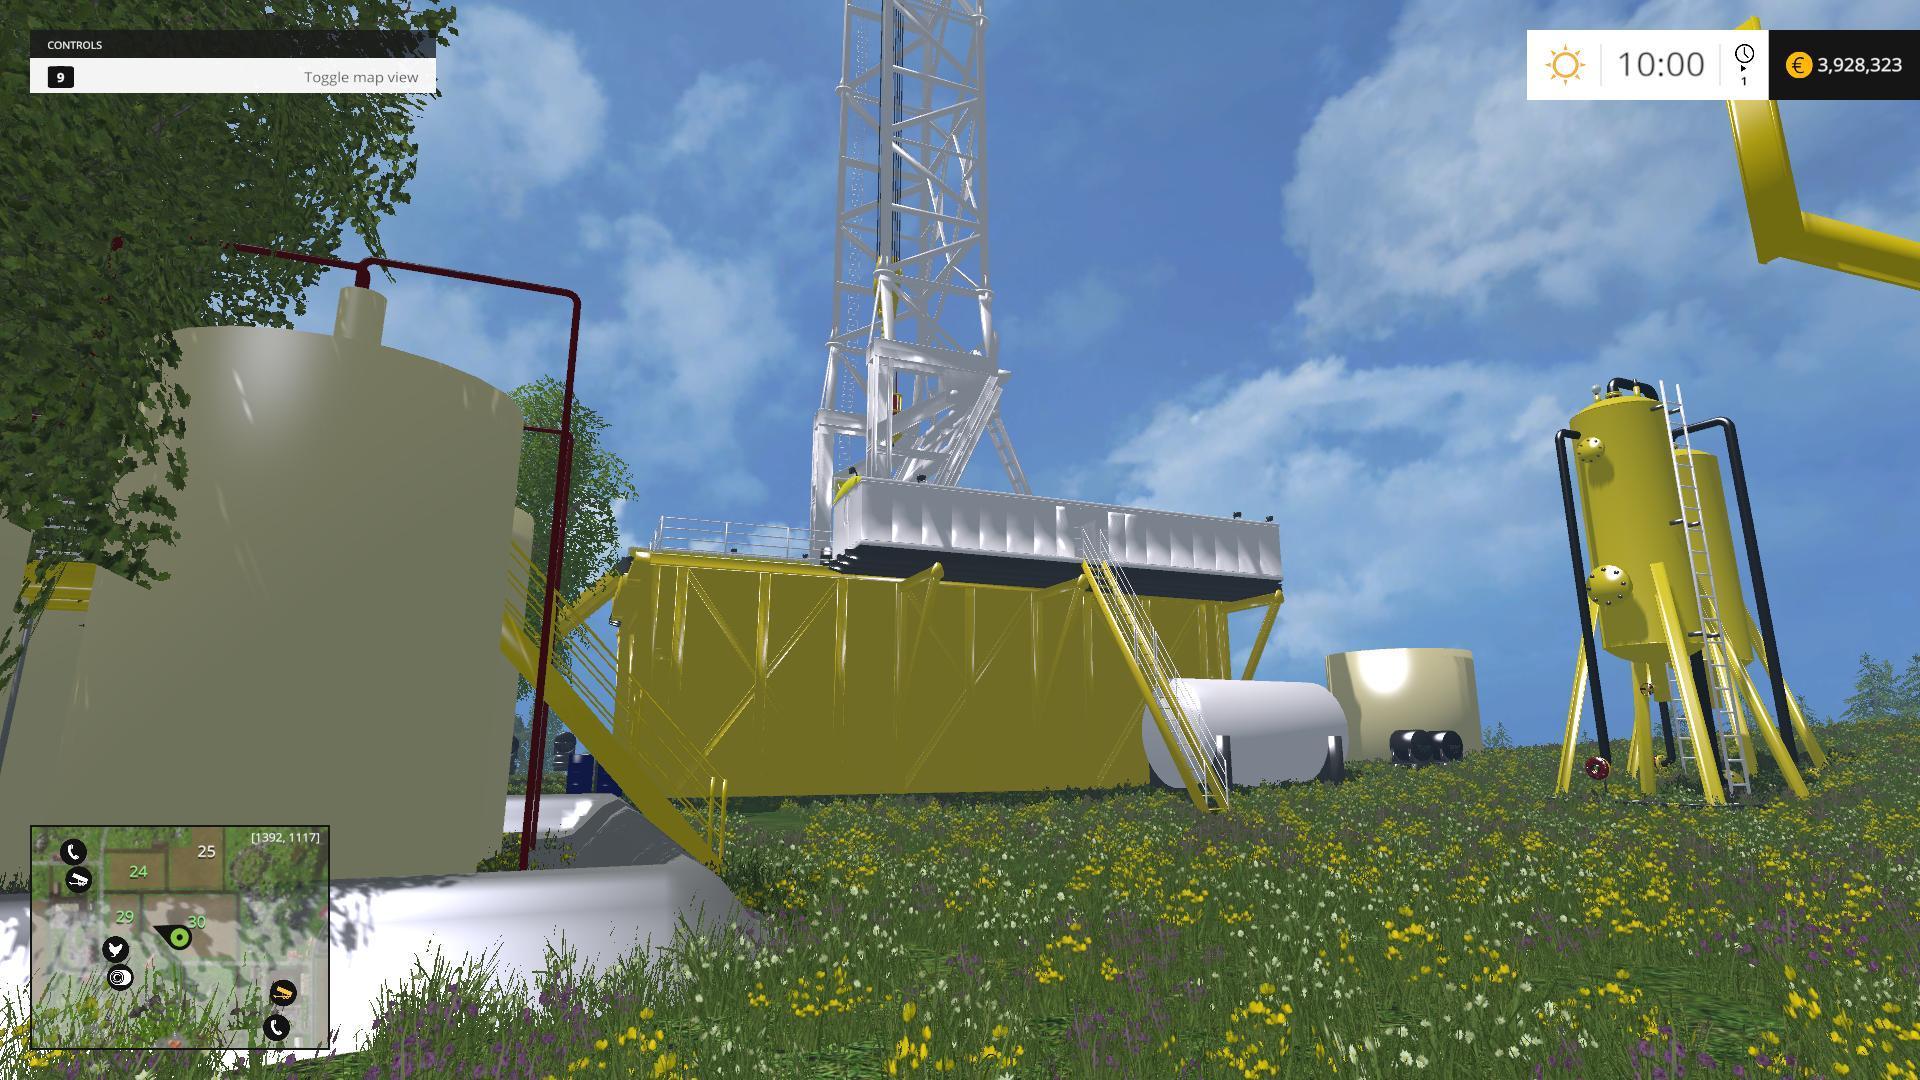 PLACEABLE RIG V1.0 MOD - Farming simulator 2019 / 2017 ...